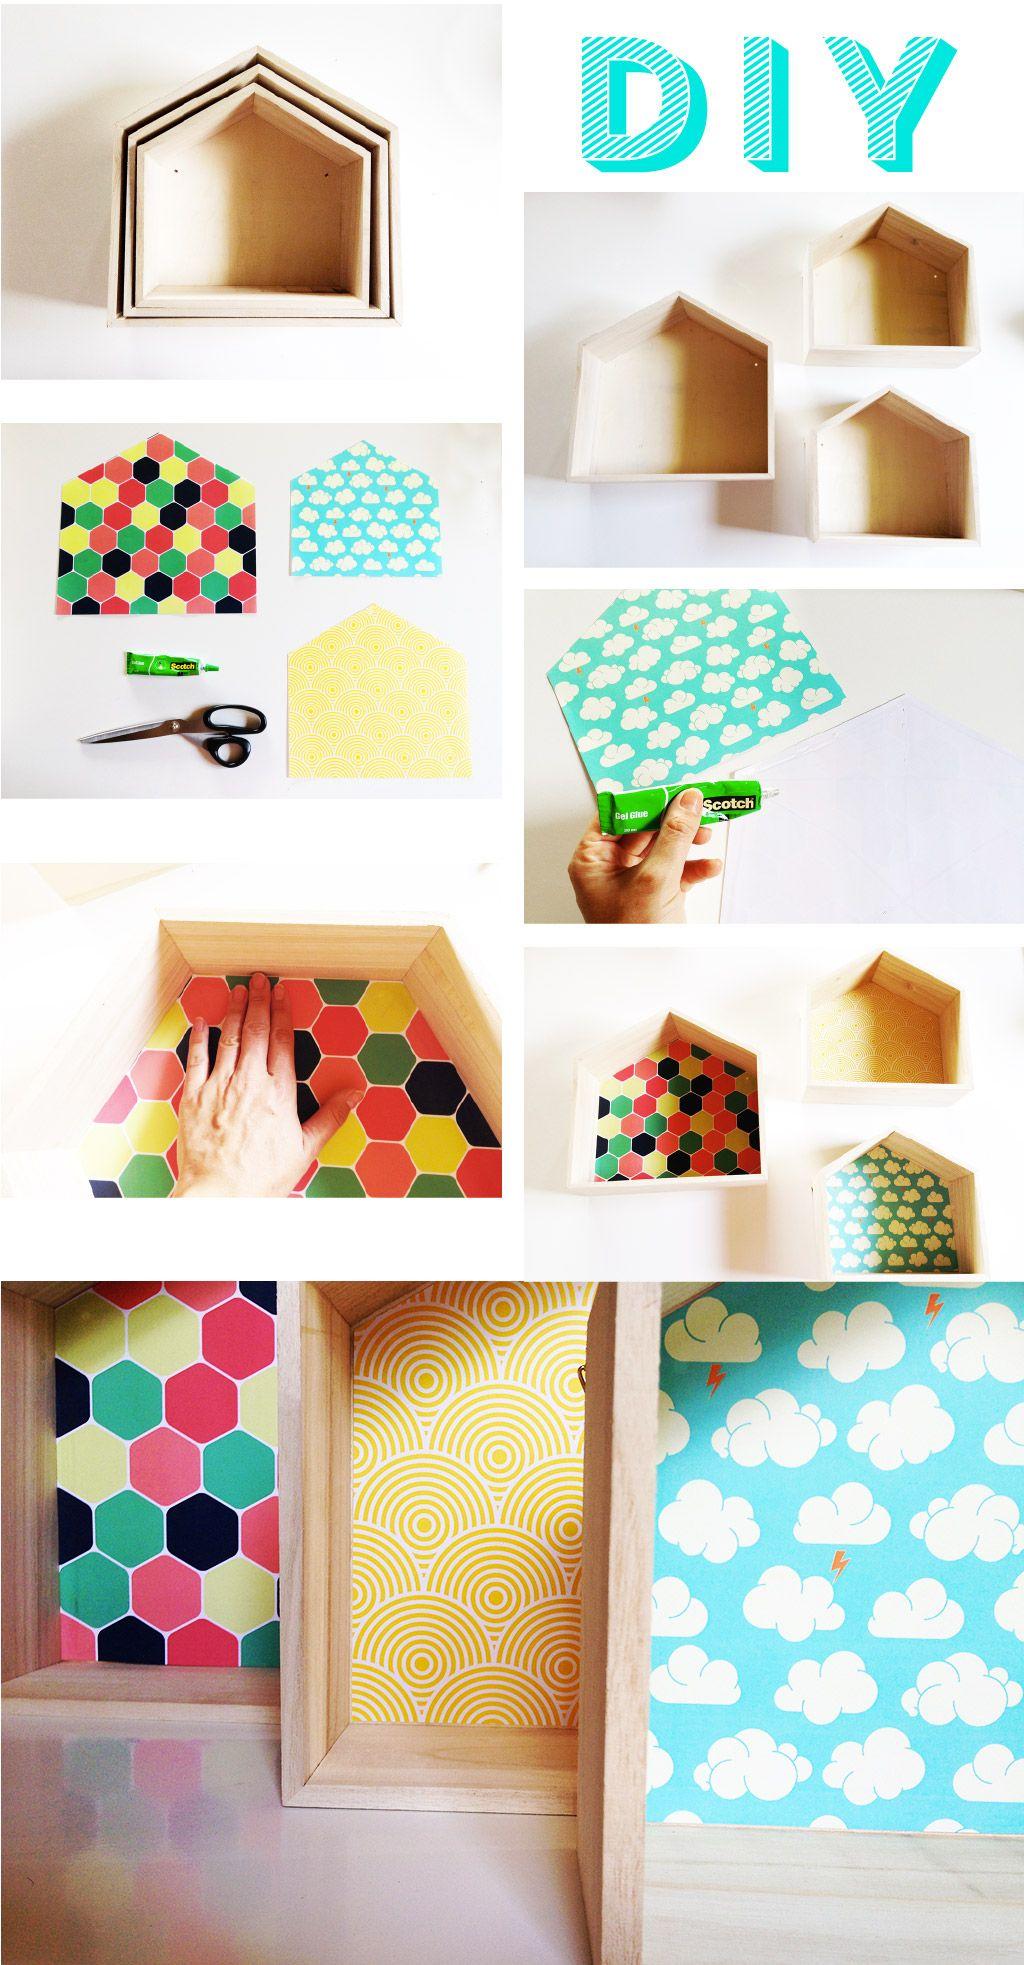 CHAMBRE-ENFANT-KIDROOM-HOME-CABANE-EN-BOIS-DIY-16 | Deco | Pinterest ...